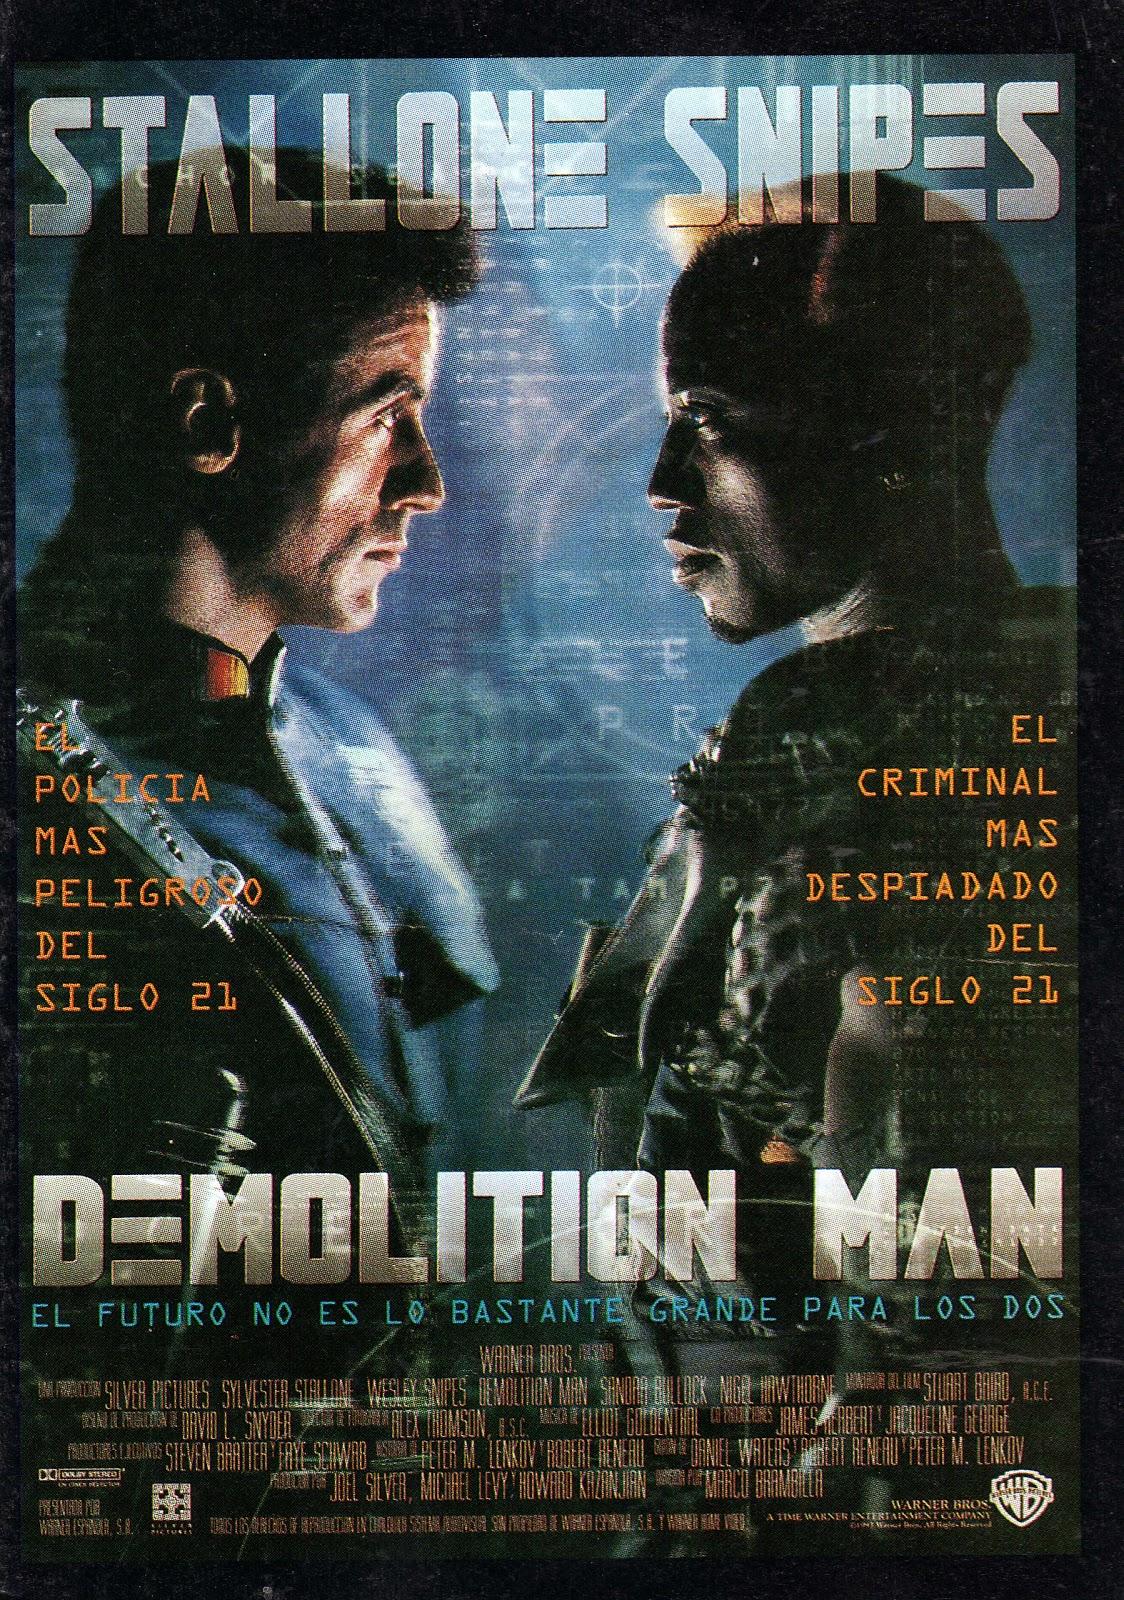 http://3.bp.blogspot.com/-wB7RGbTXDSs/TyWdzxdjREI/AAAAAAAABC4/zy8_UWTPc8U/s1600/0430+Demolition+man.jpg